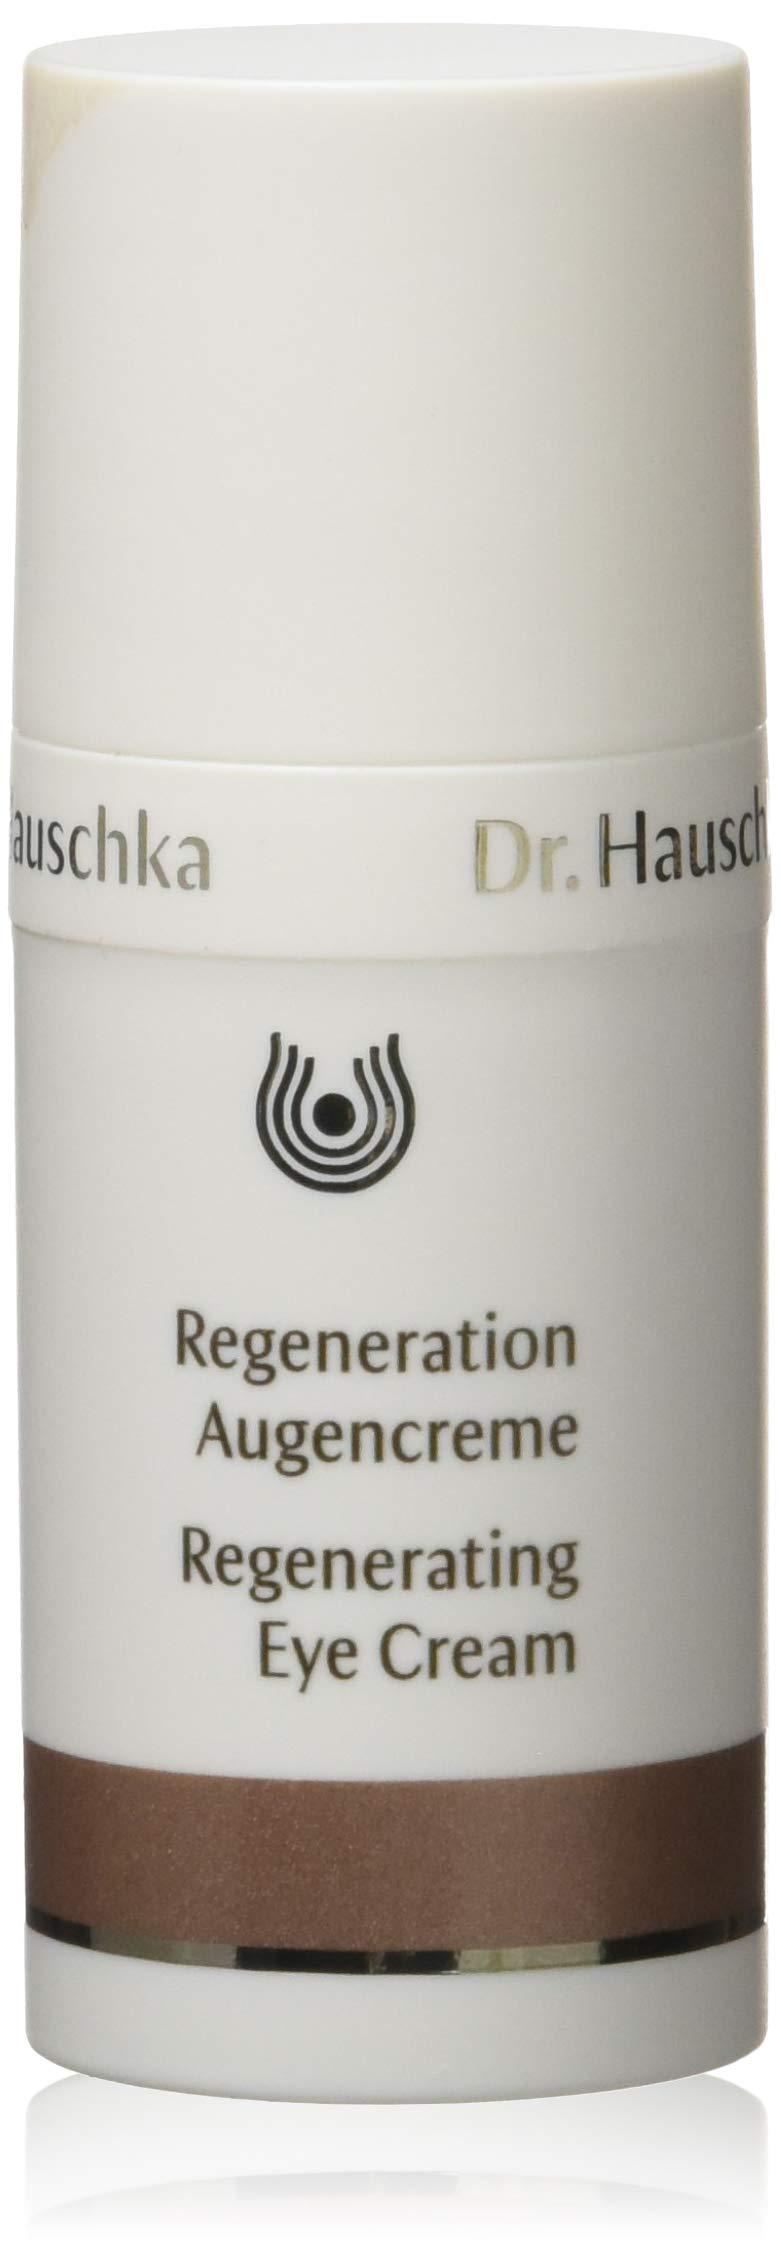 Dr. Hauschka Regenerating Eye Cream, 0.5 Ounce